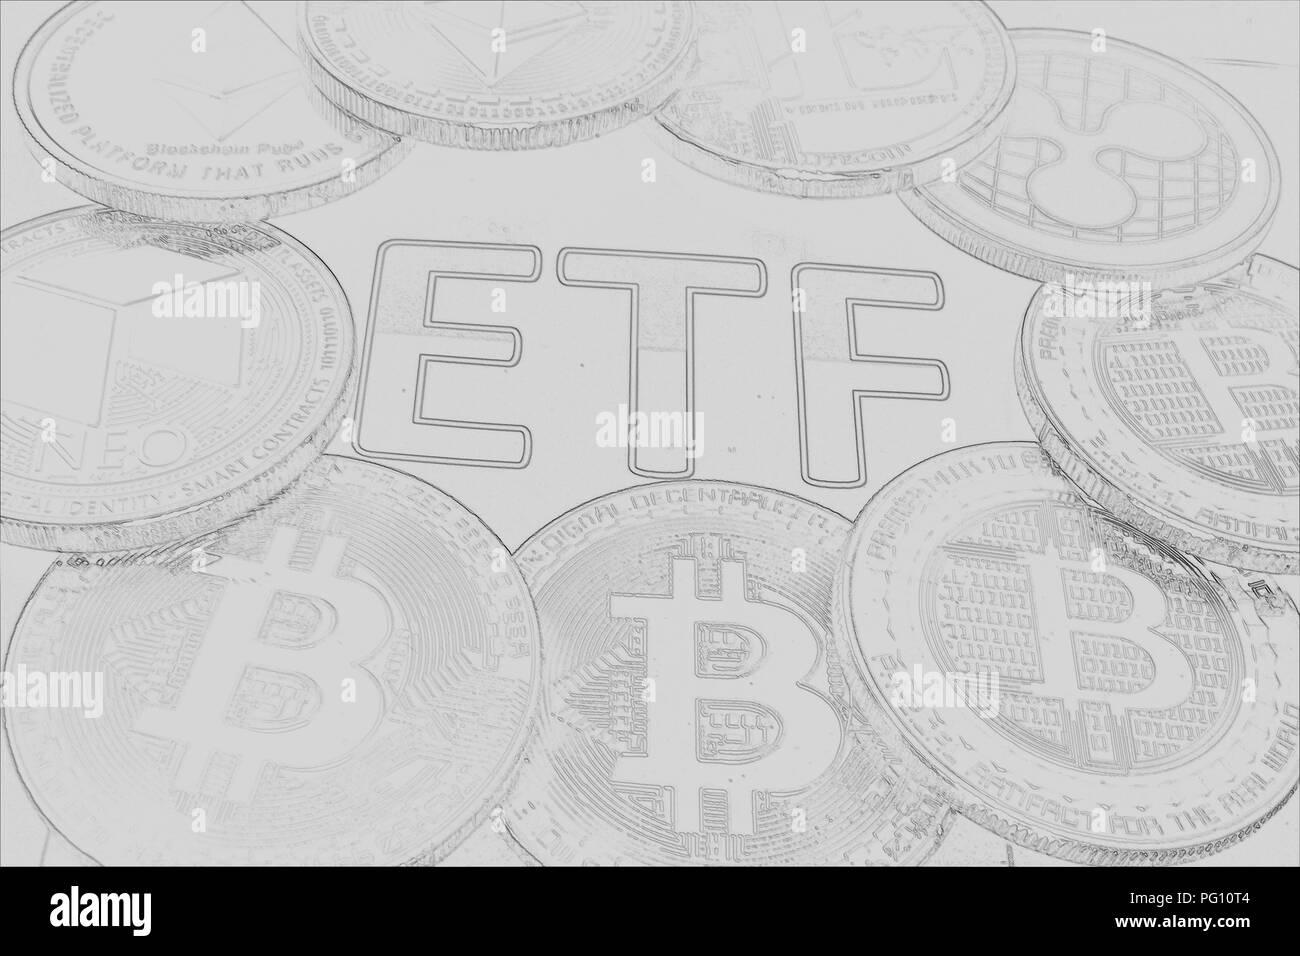 A crypto ETF - the next step towards a decentrailzed future for our money - bitcoin ETF pencil drawn Stock Photo